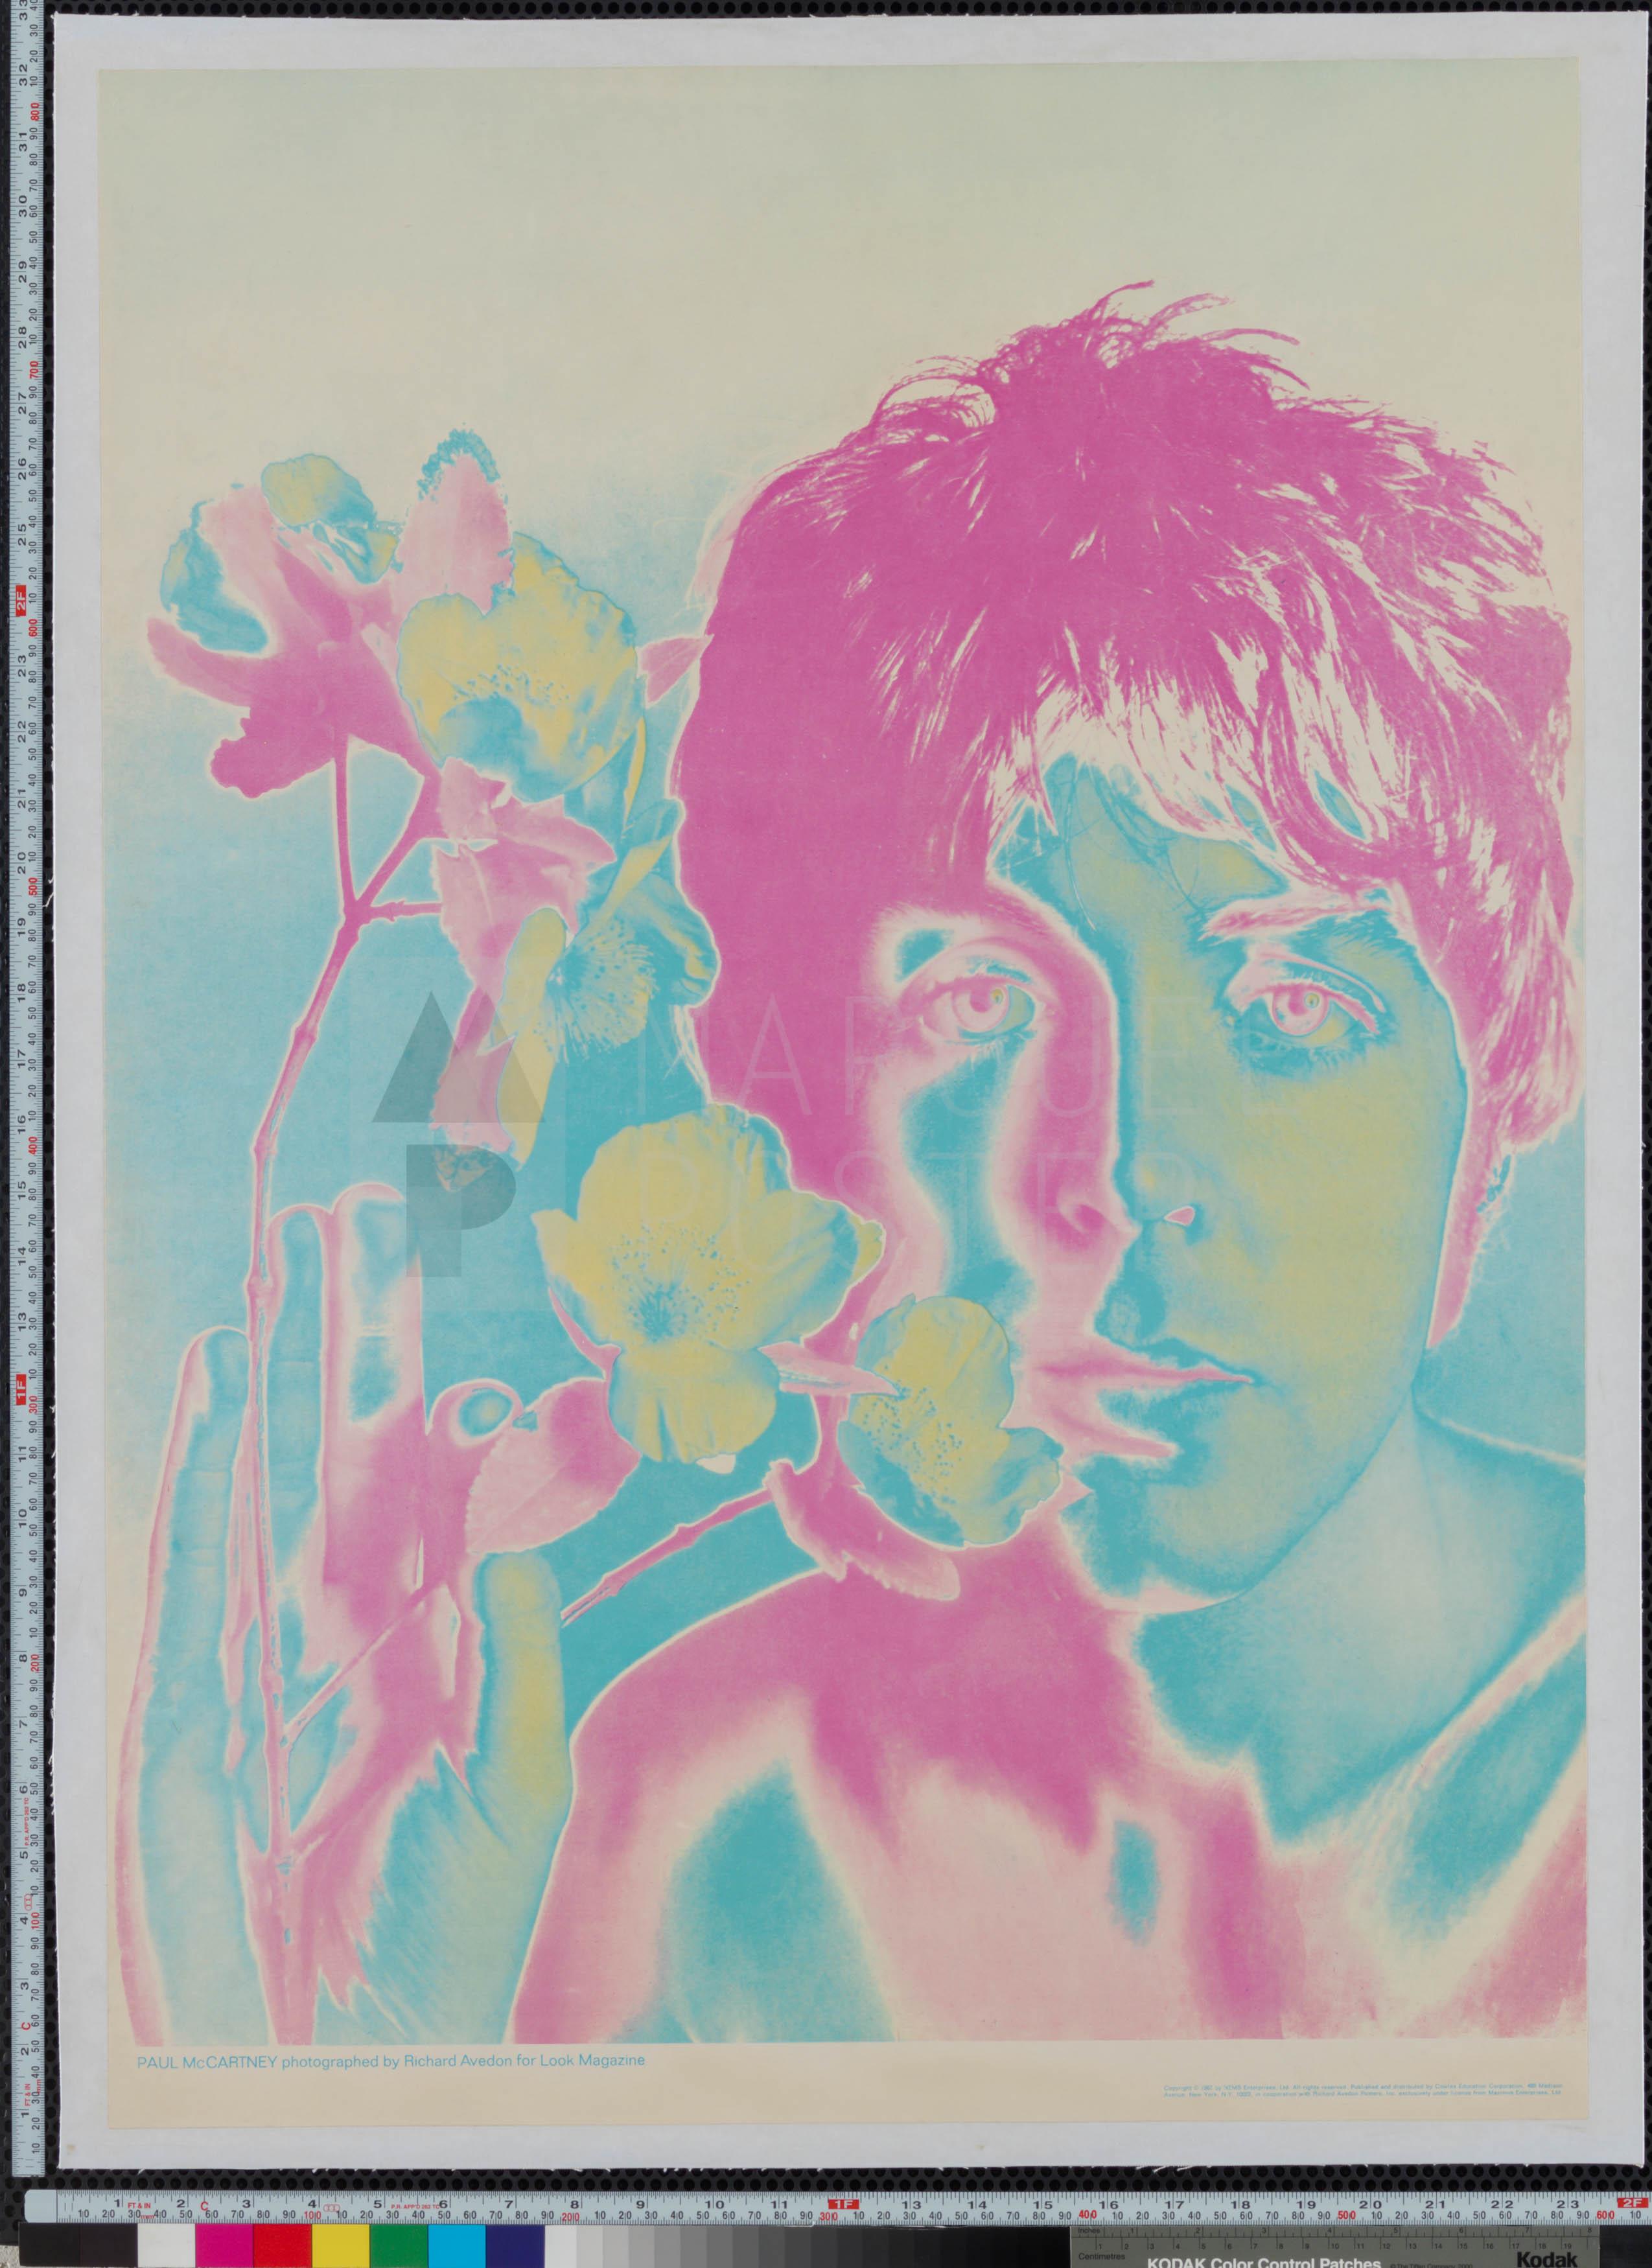 18-paul-mccartney-avedon-nems-style-us-a1-1967-02